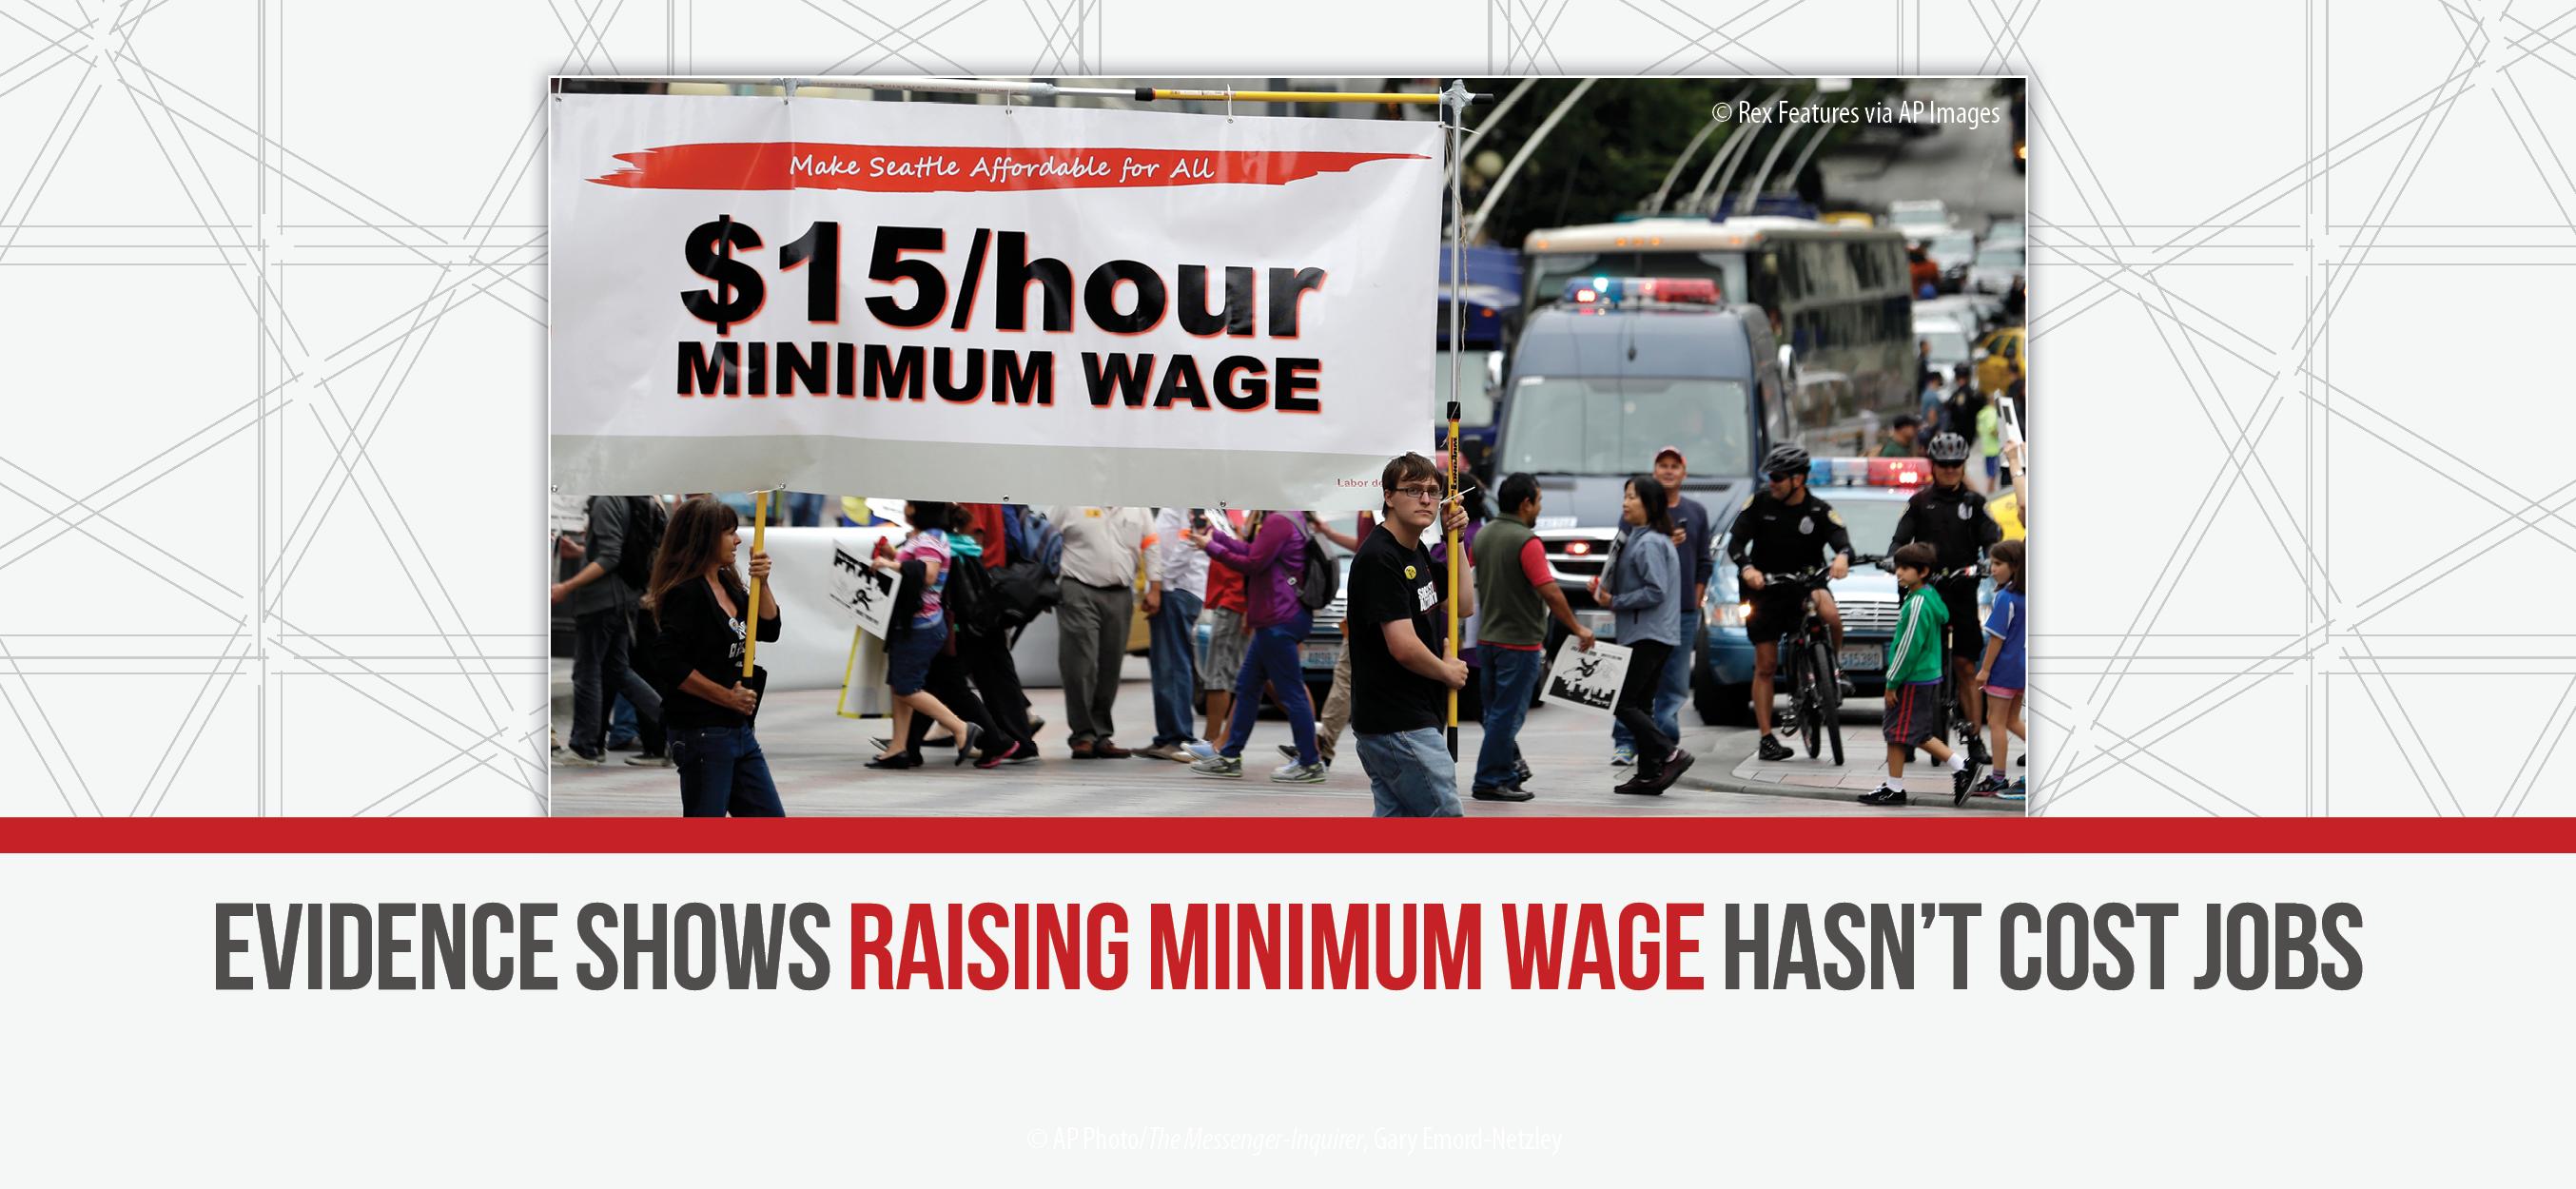 005 Essay On Minimum Wage Example 2014 Mar Apr Images5 Beautiful Free Argumentative Increase Full